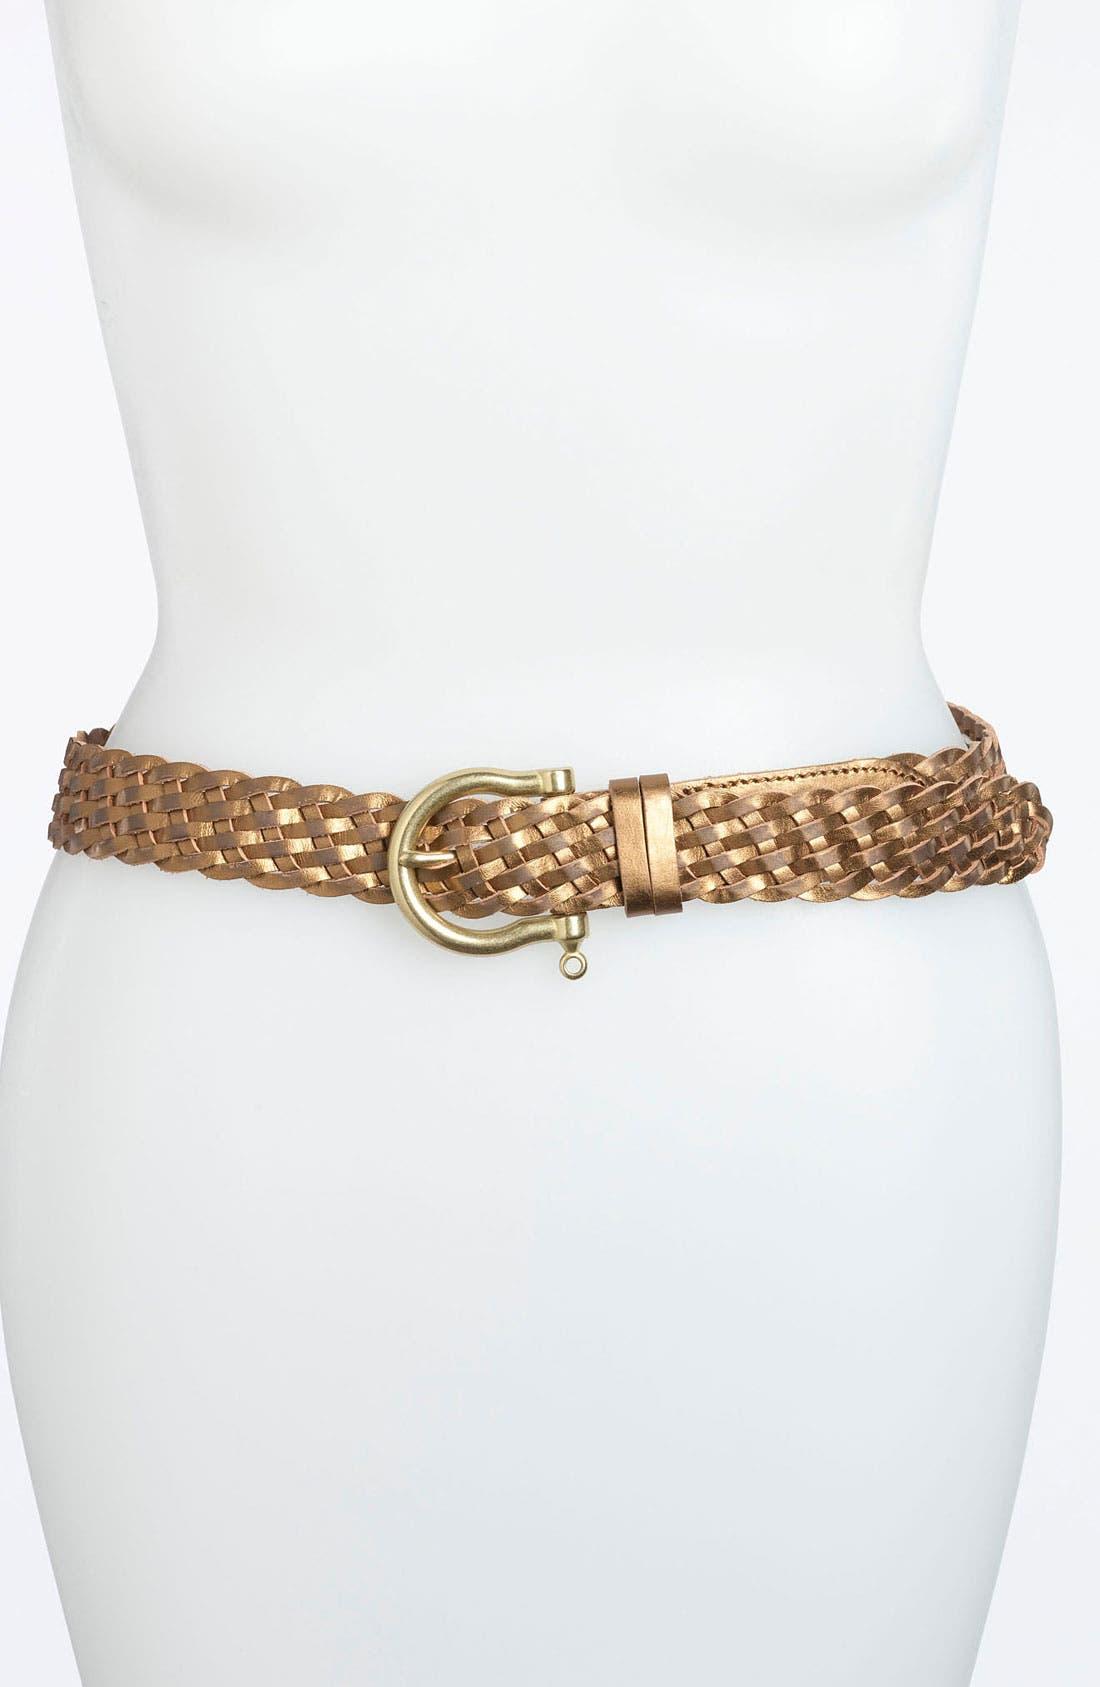 Main Image - Sperry Top-Sider® Metallic Braided Belt